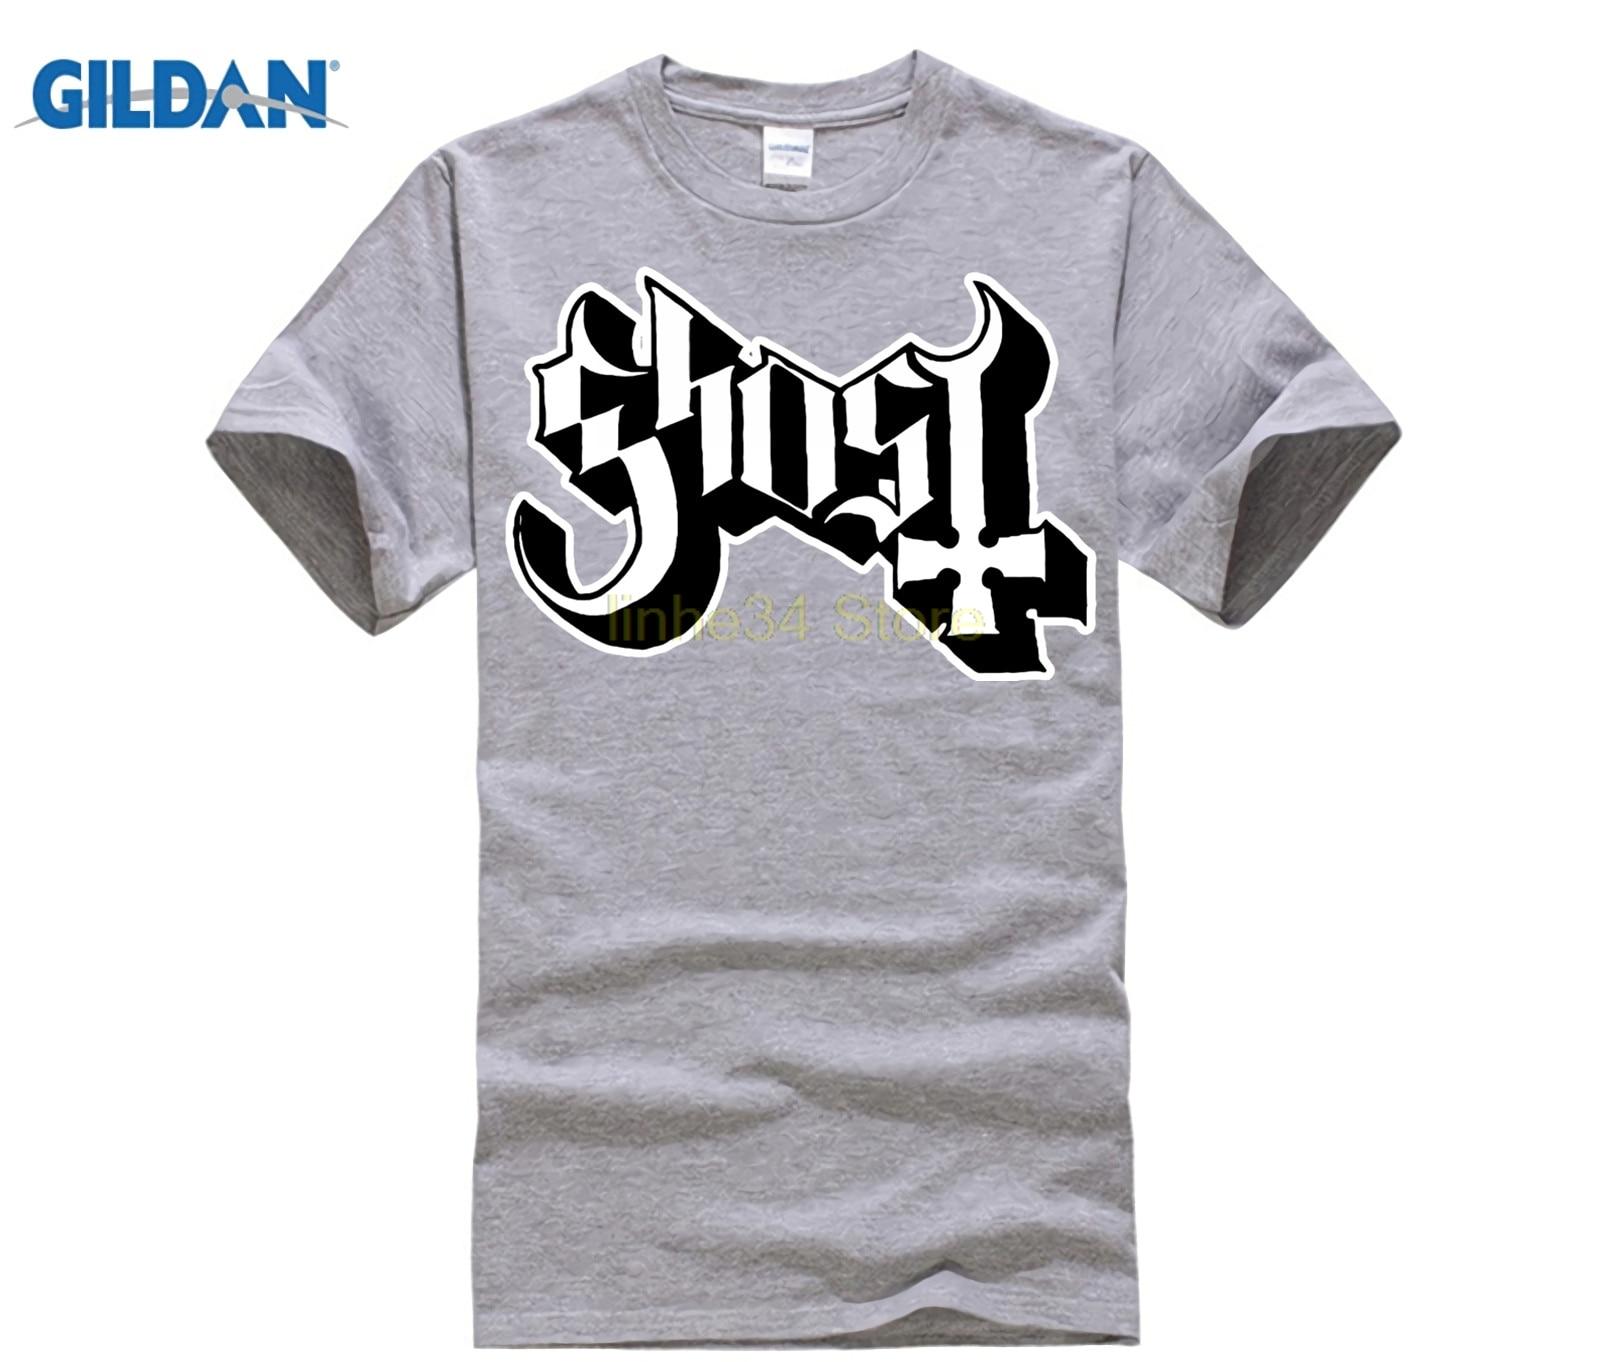 Cheap Printing Shirts Near Me – DACC